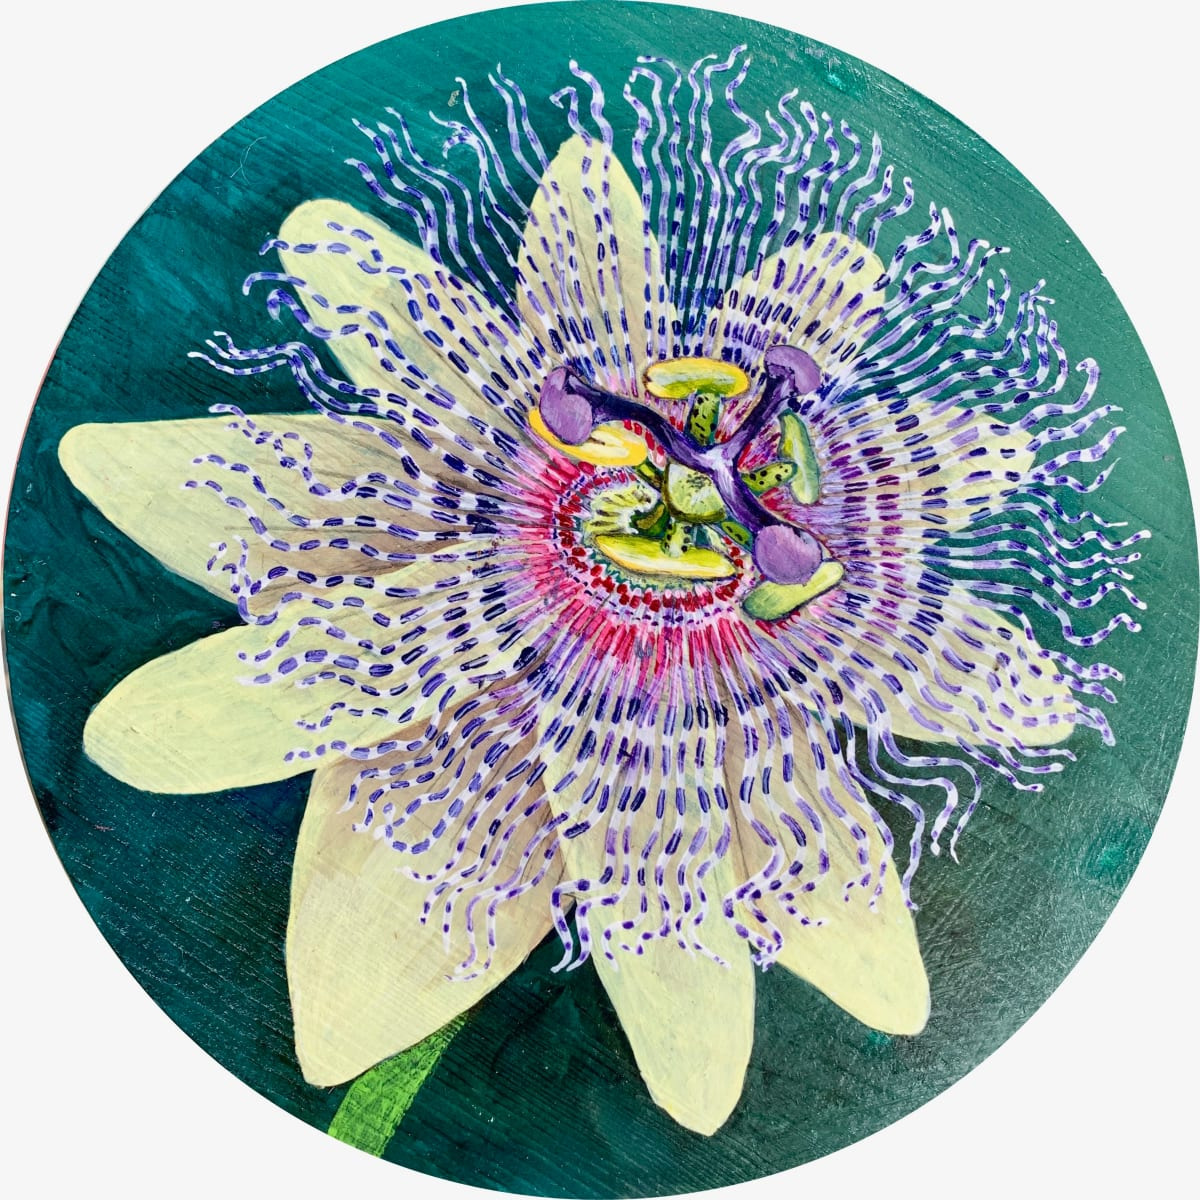 Passion Flower by Kristie Mayeaux